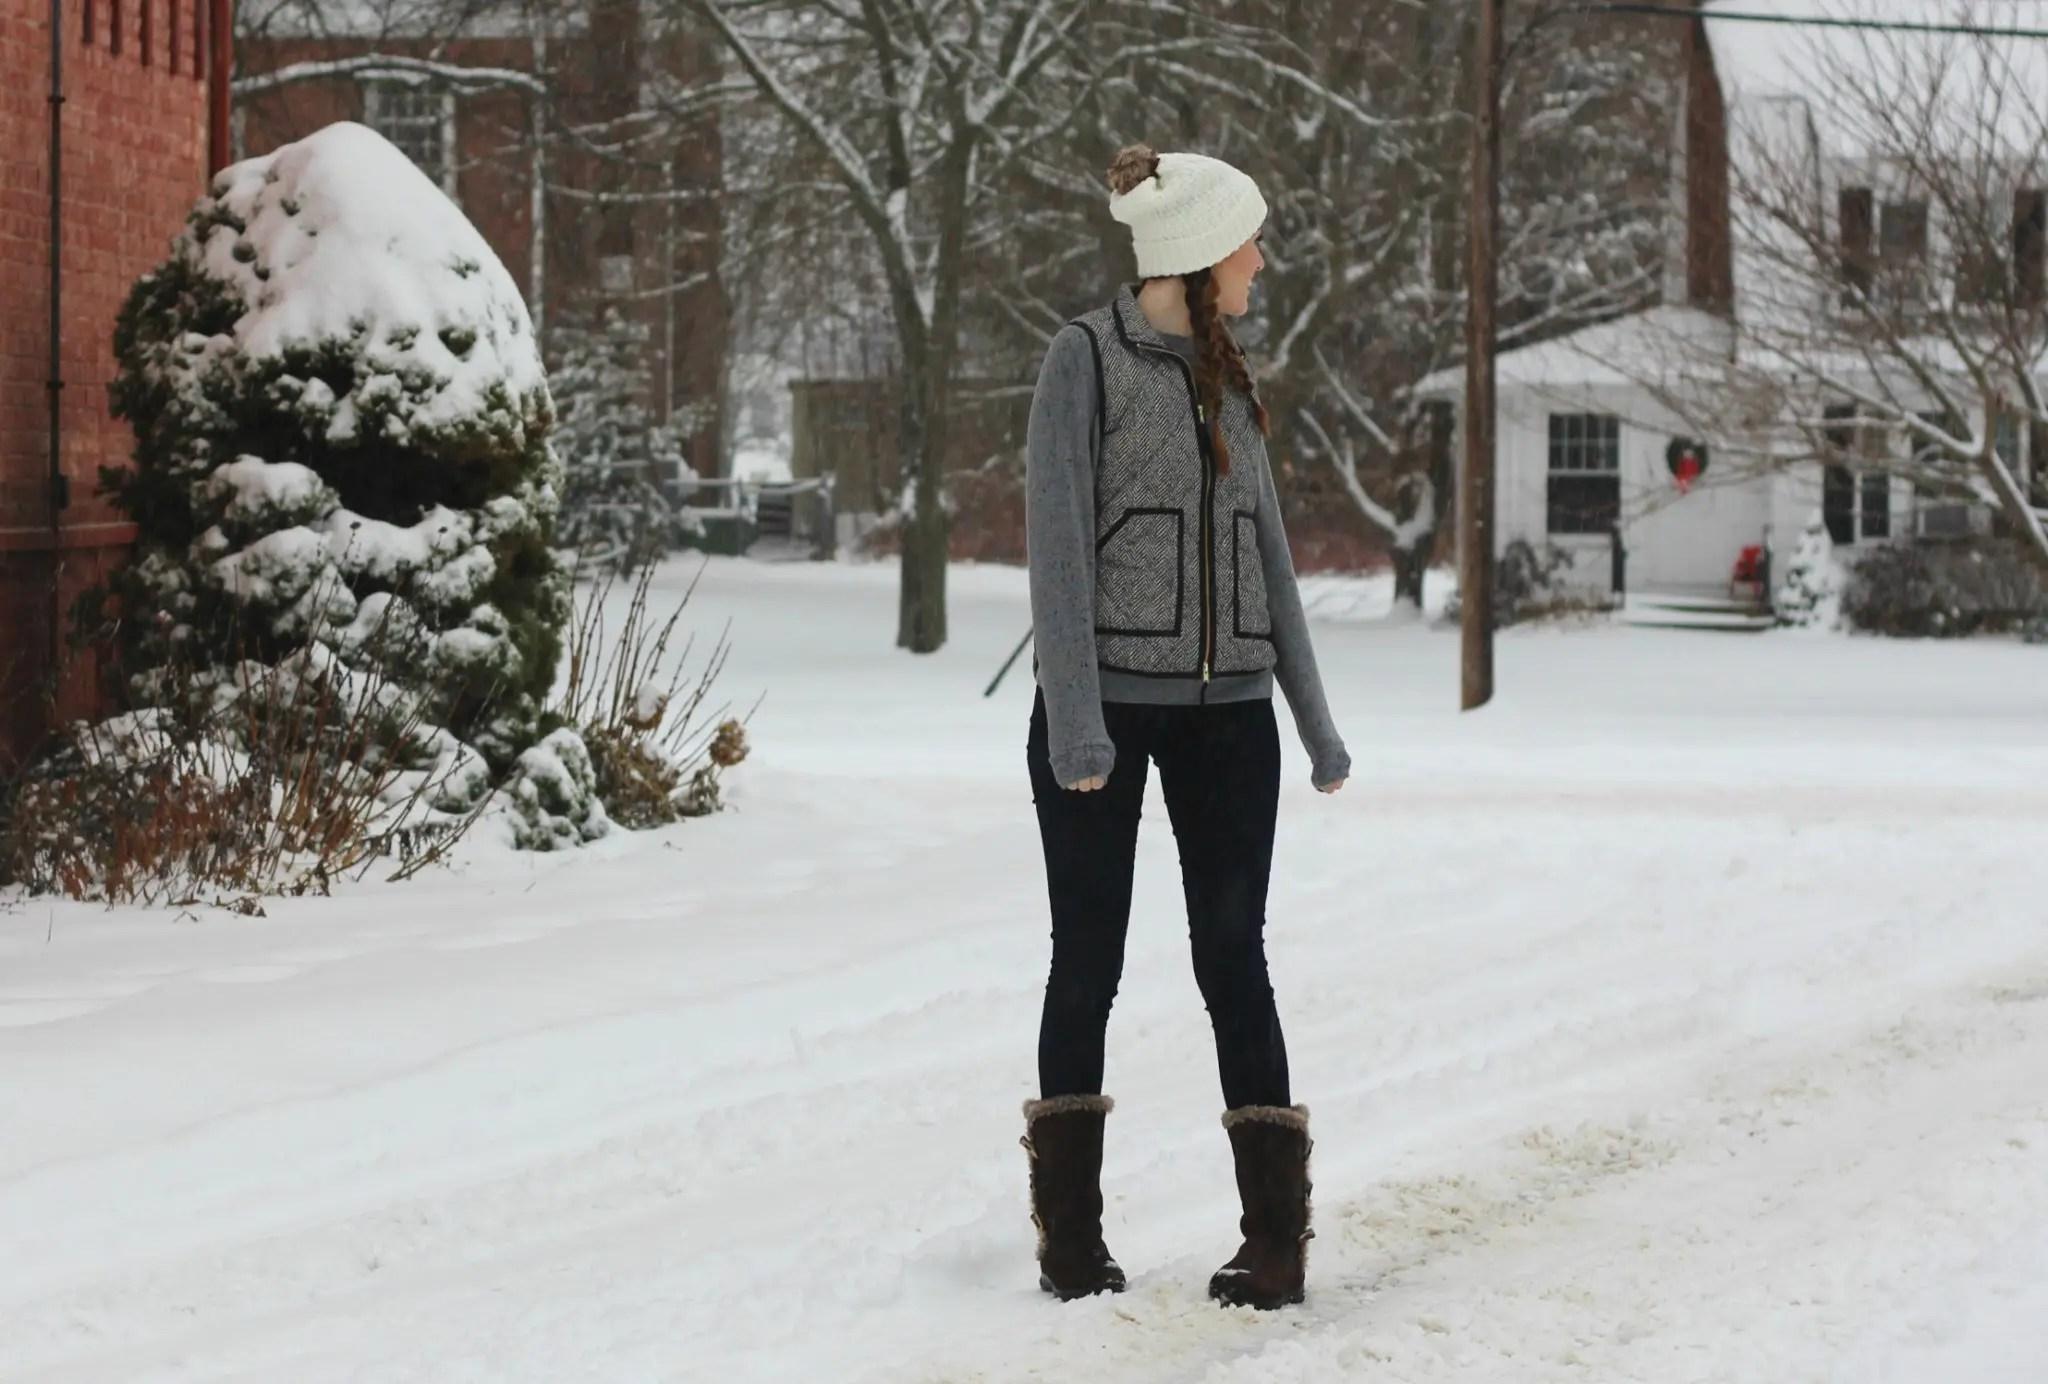 snowy-saturday-3